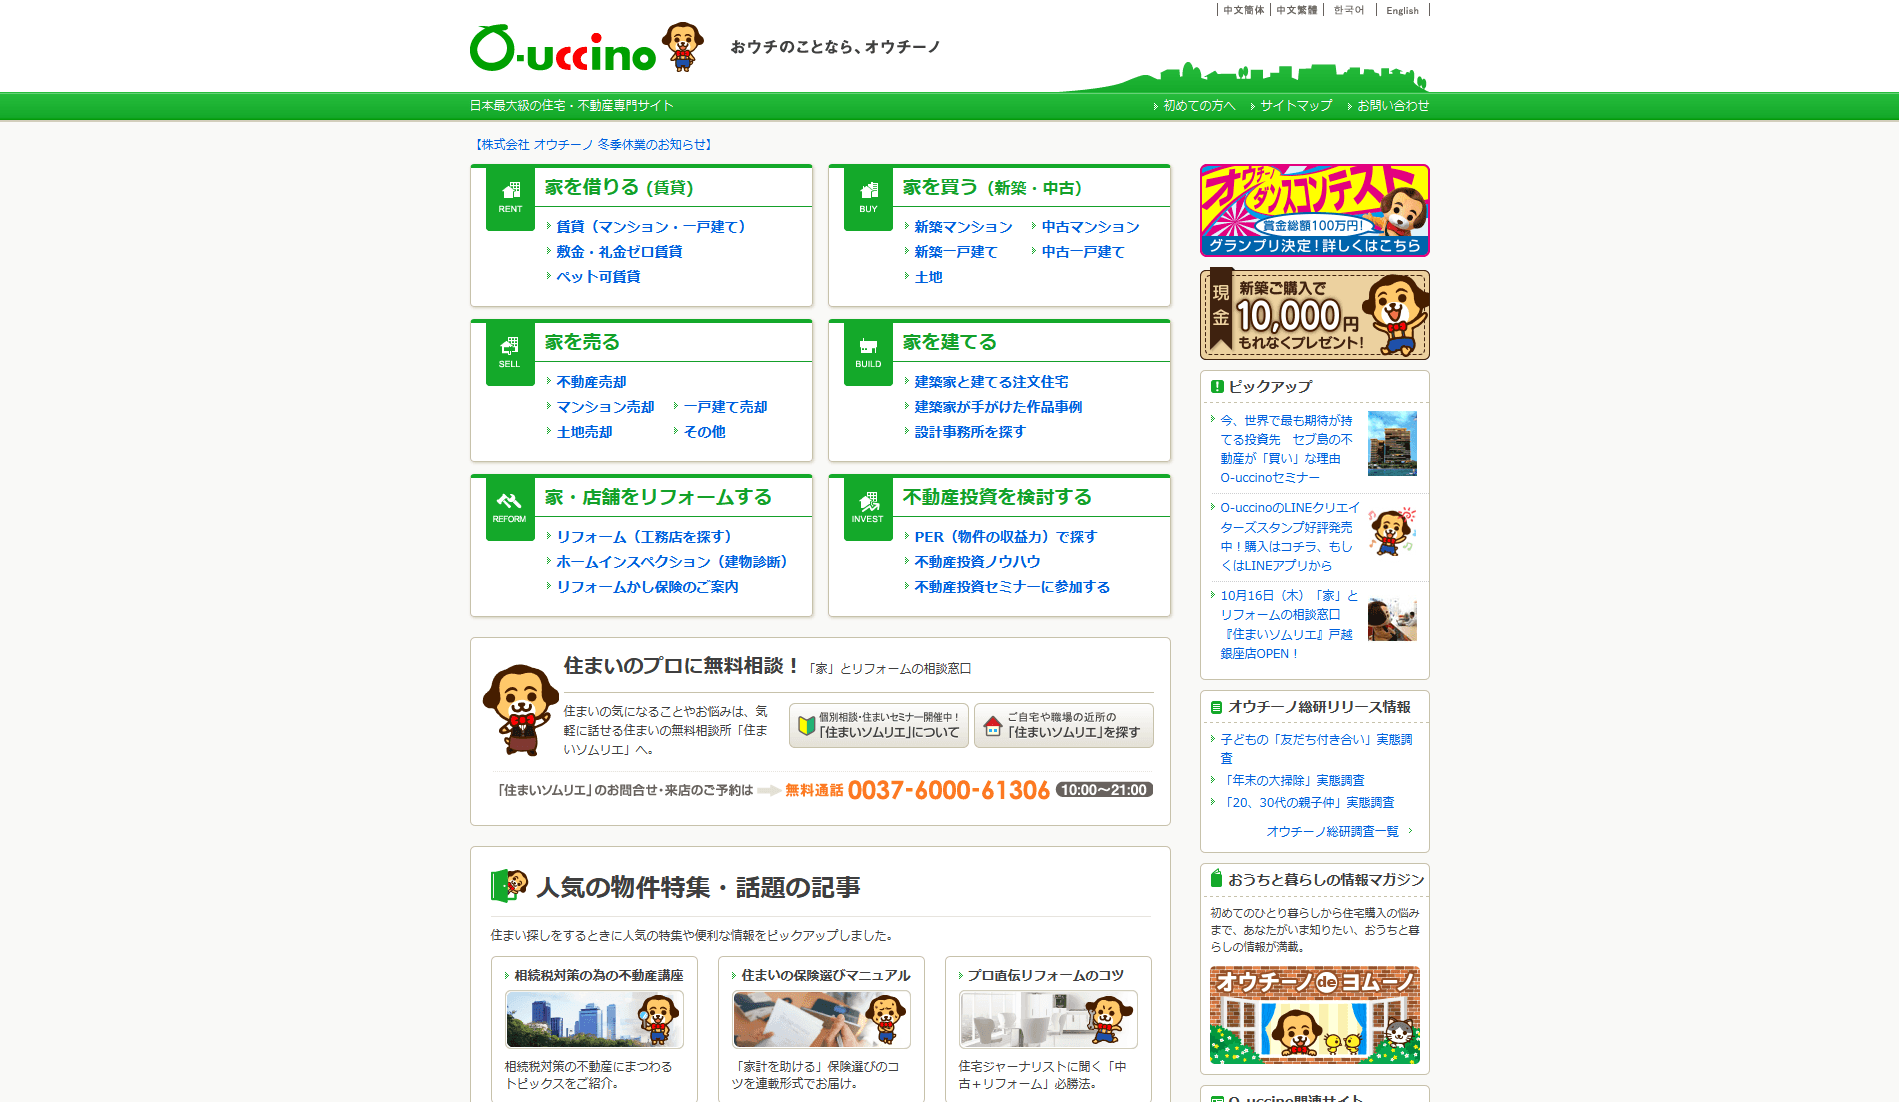 【O-uccino】不動産売買・賃貸・住宅情報の専門サイト